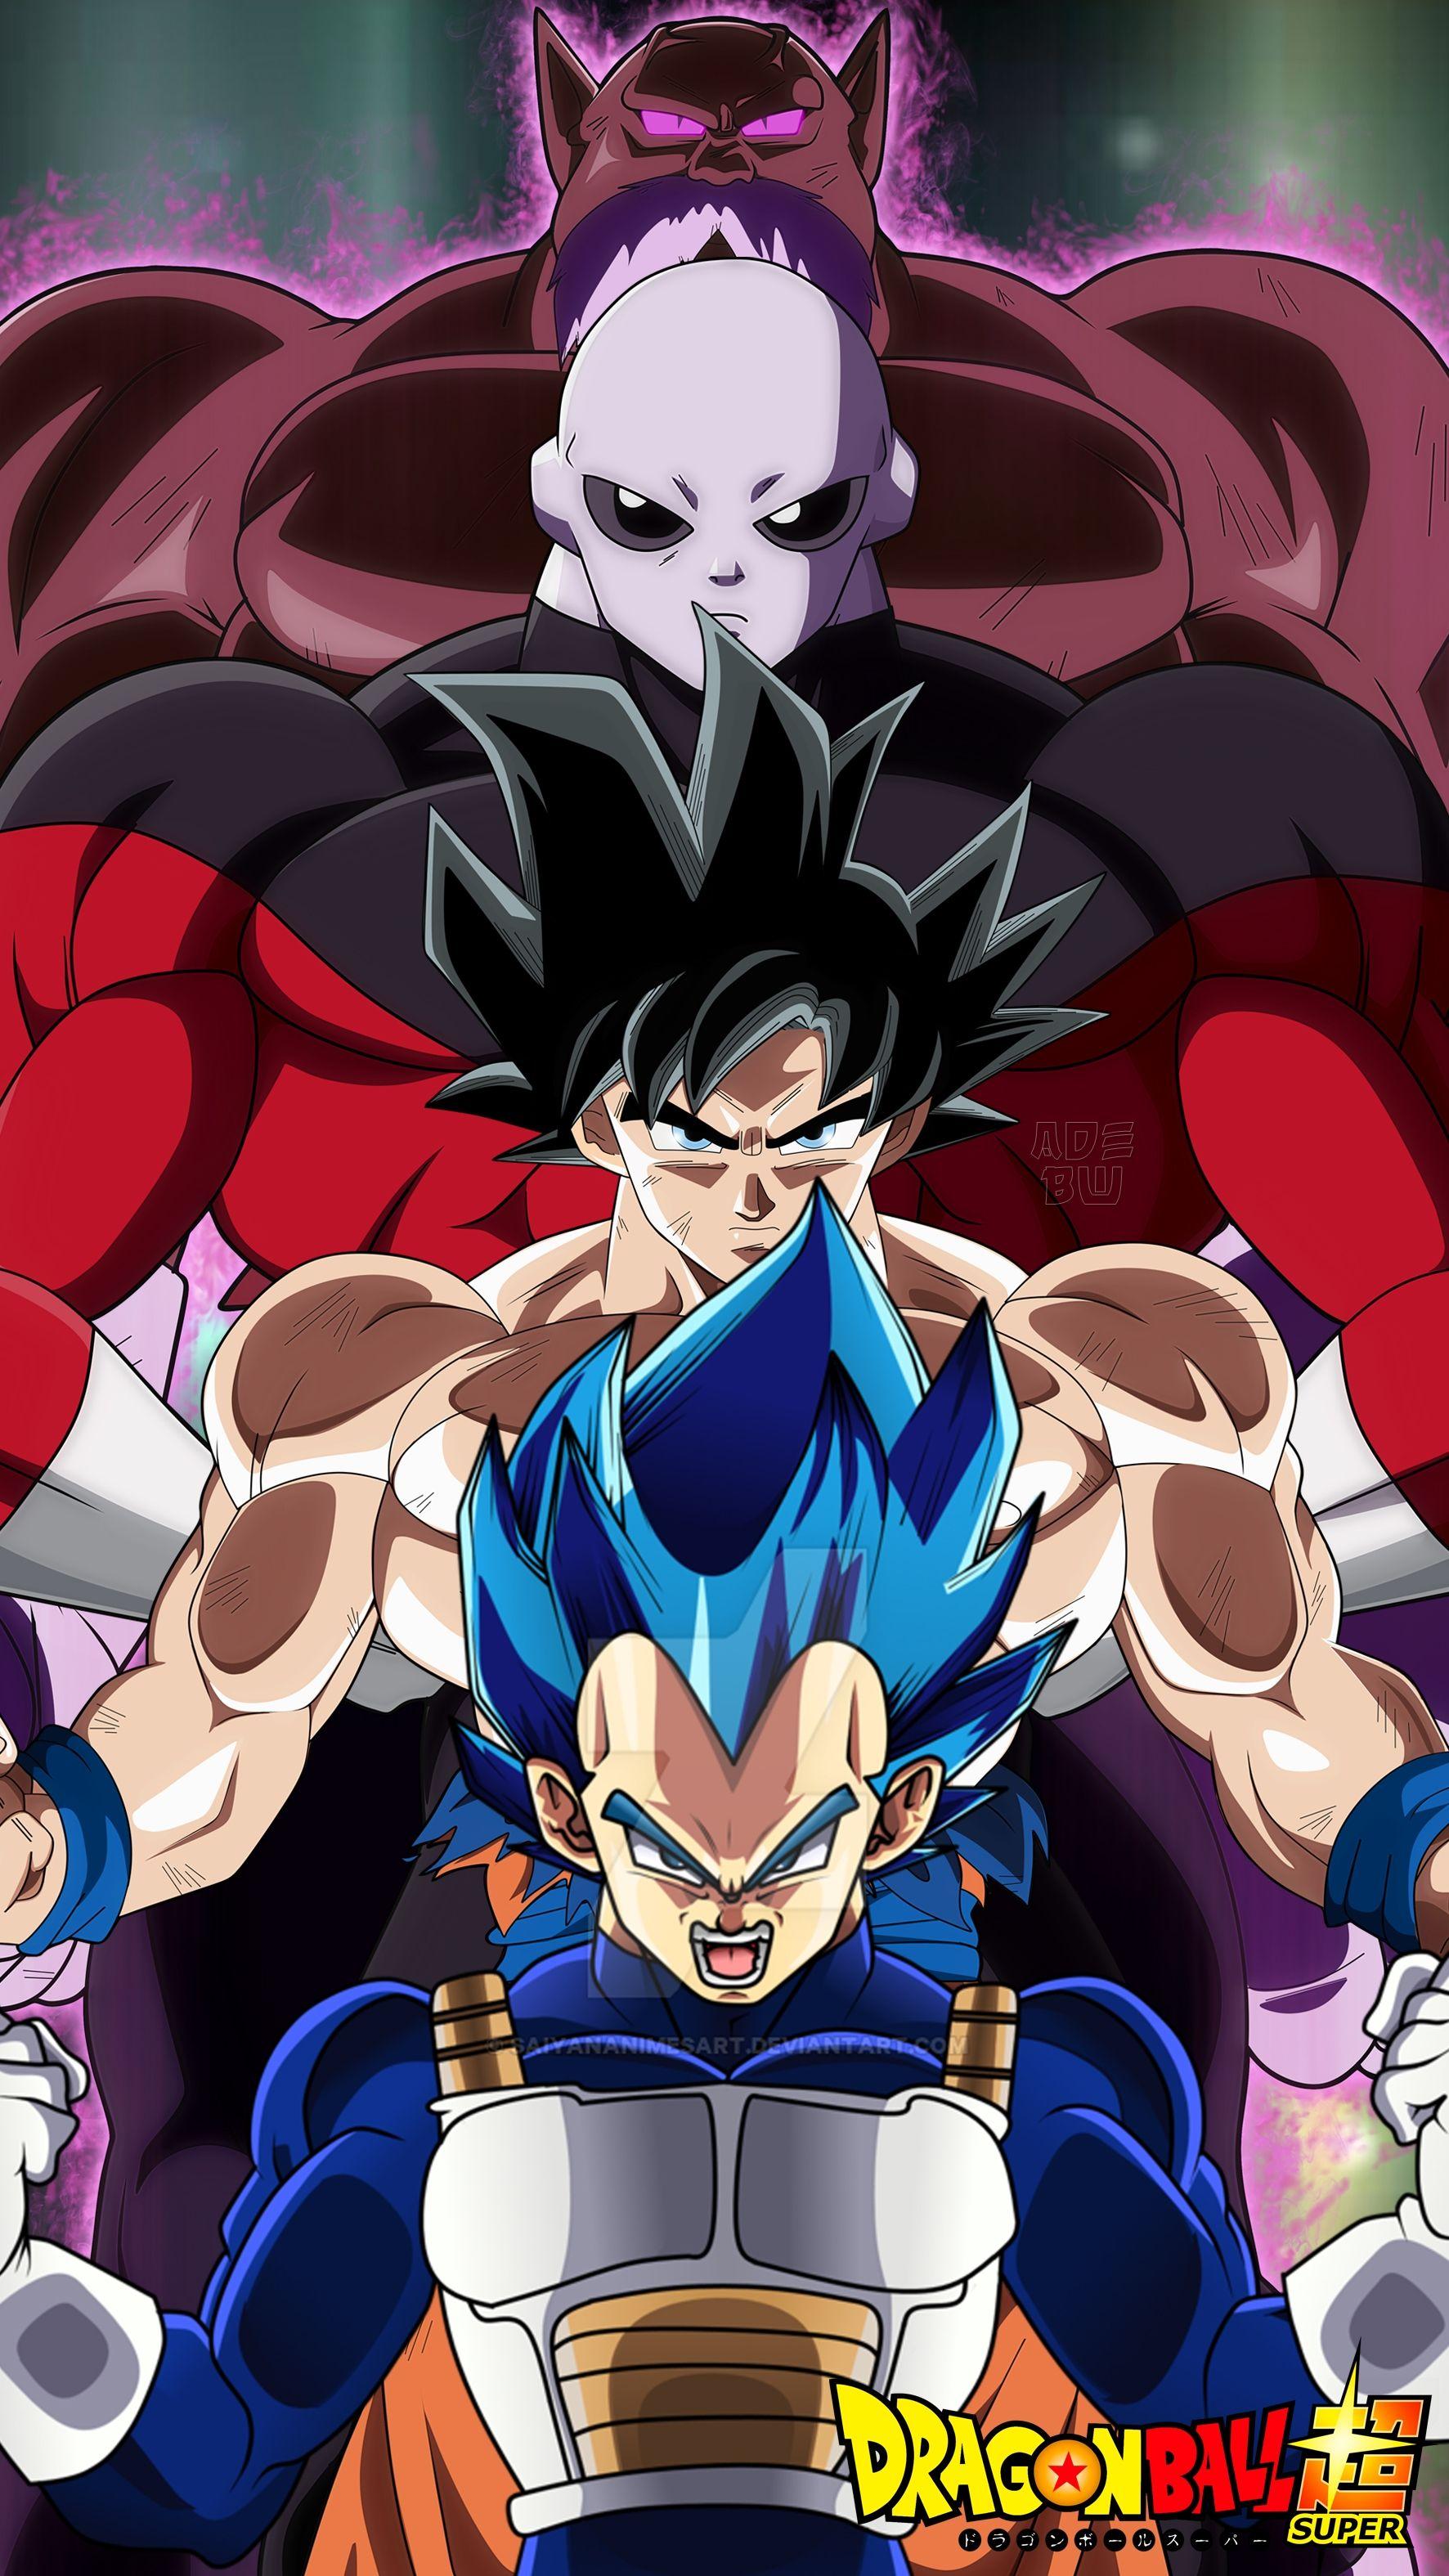 Dragonball Super Vegeta Goku Jiren And Toppo Anime Dragon